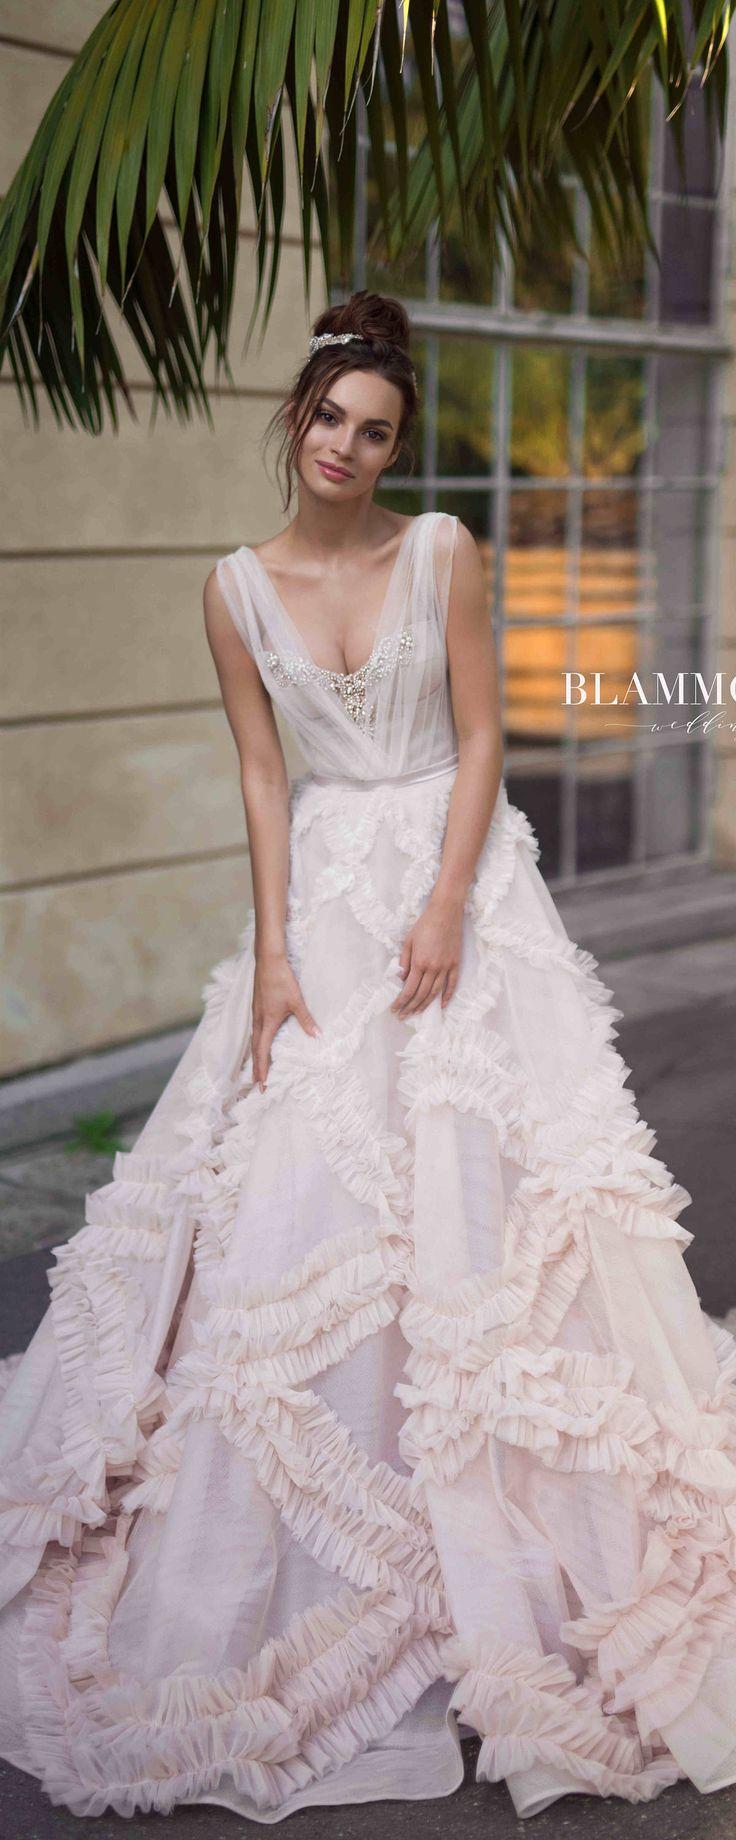 Unique wedding dress NOEL, bohemian wedding dress, tulle wedding dress, ball gown wedding dress, the princess bride, wedding dress